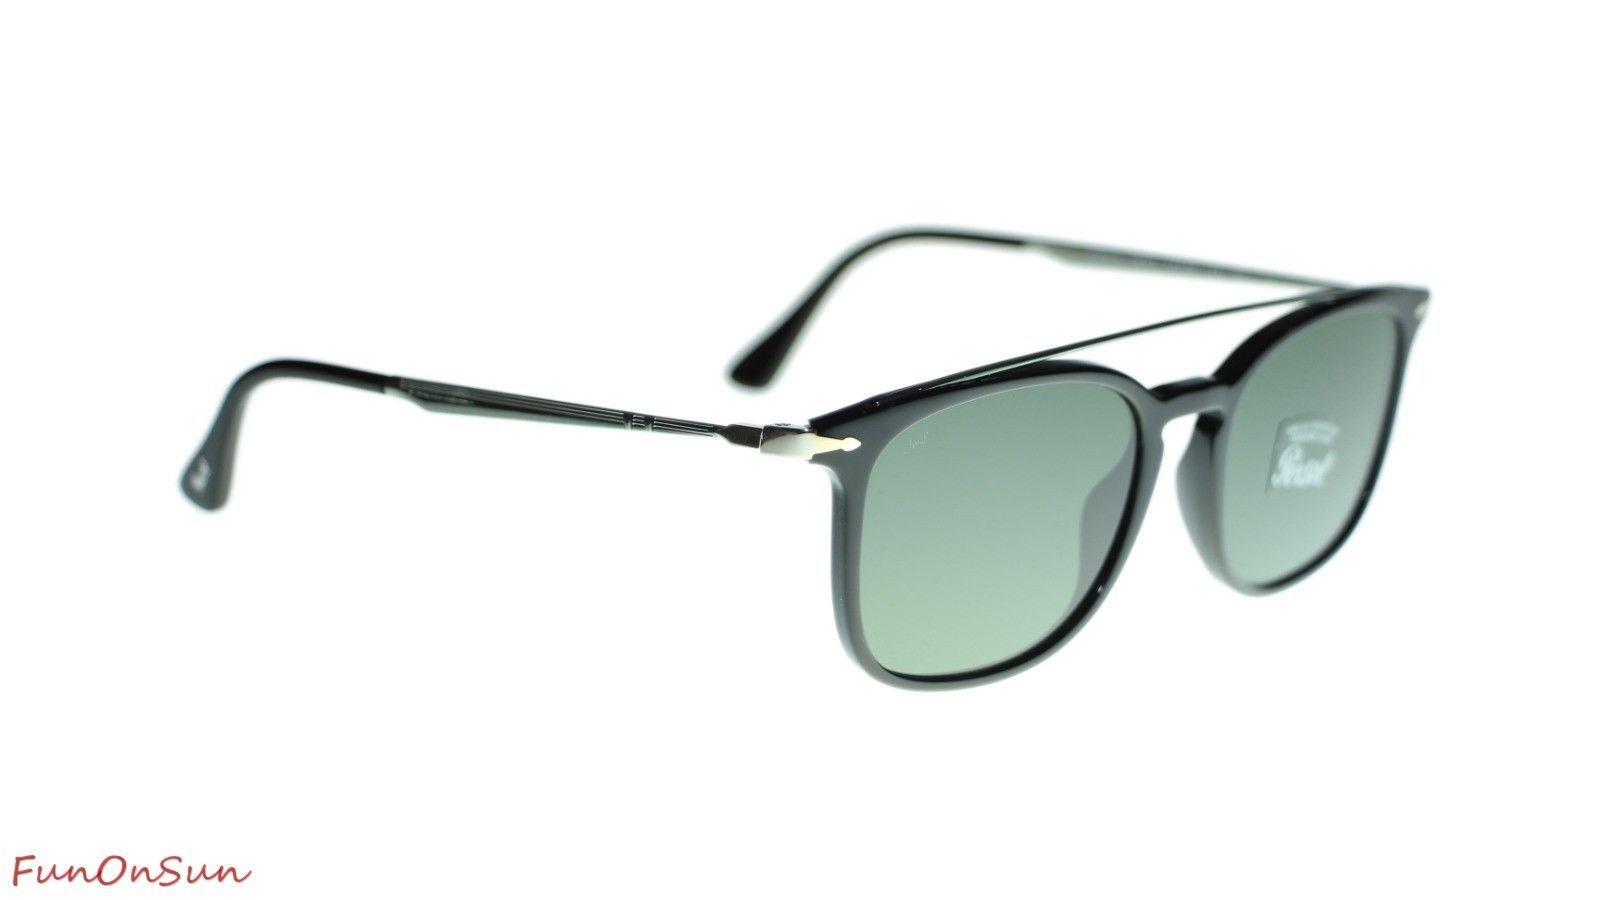 9df295c37c898 Persol Mens Rectangle Sunglasses PO3173S 9531 Black Green Lens 54mm